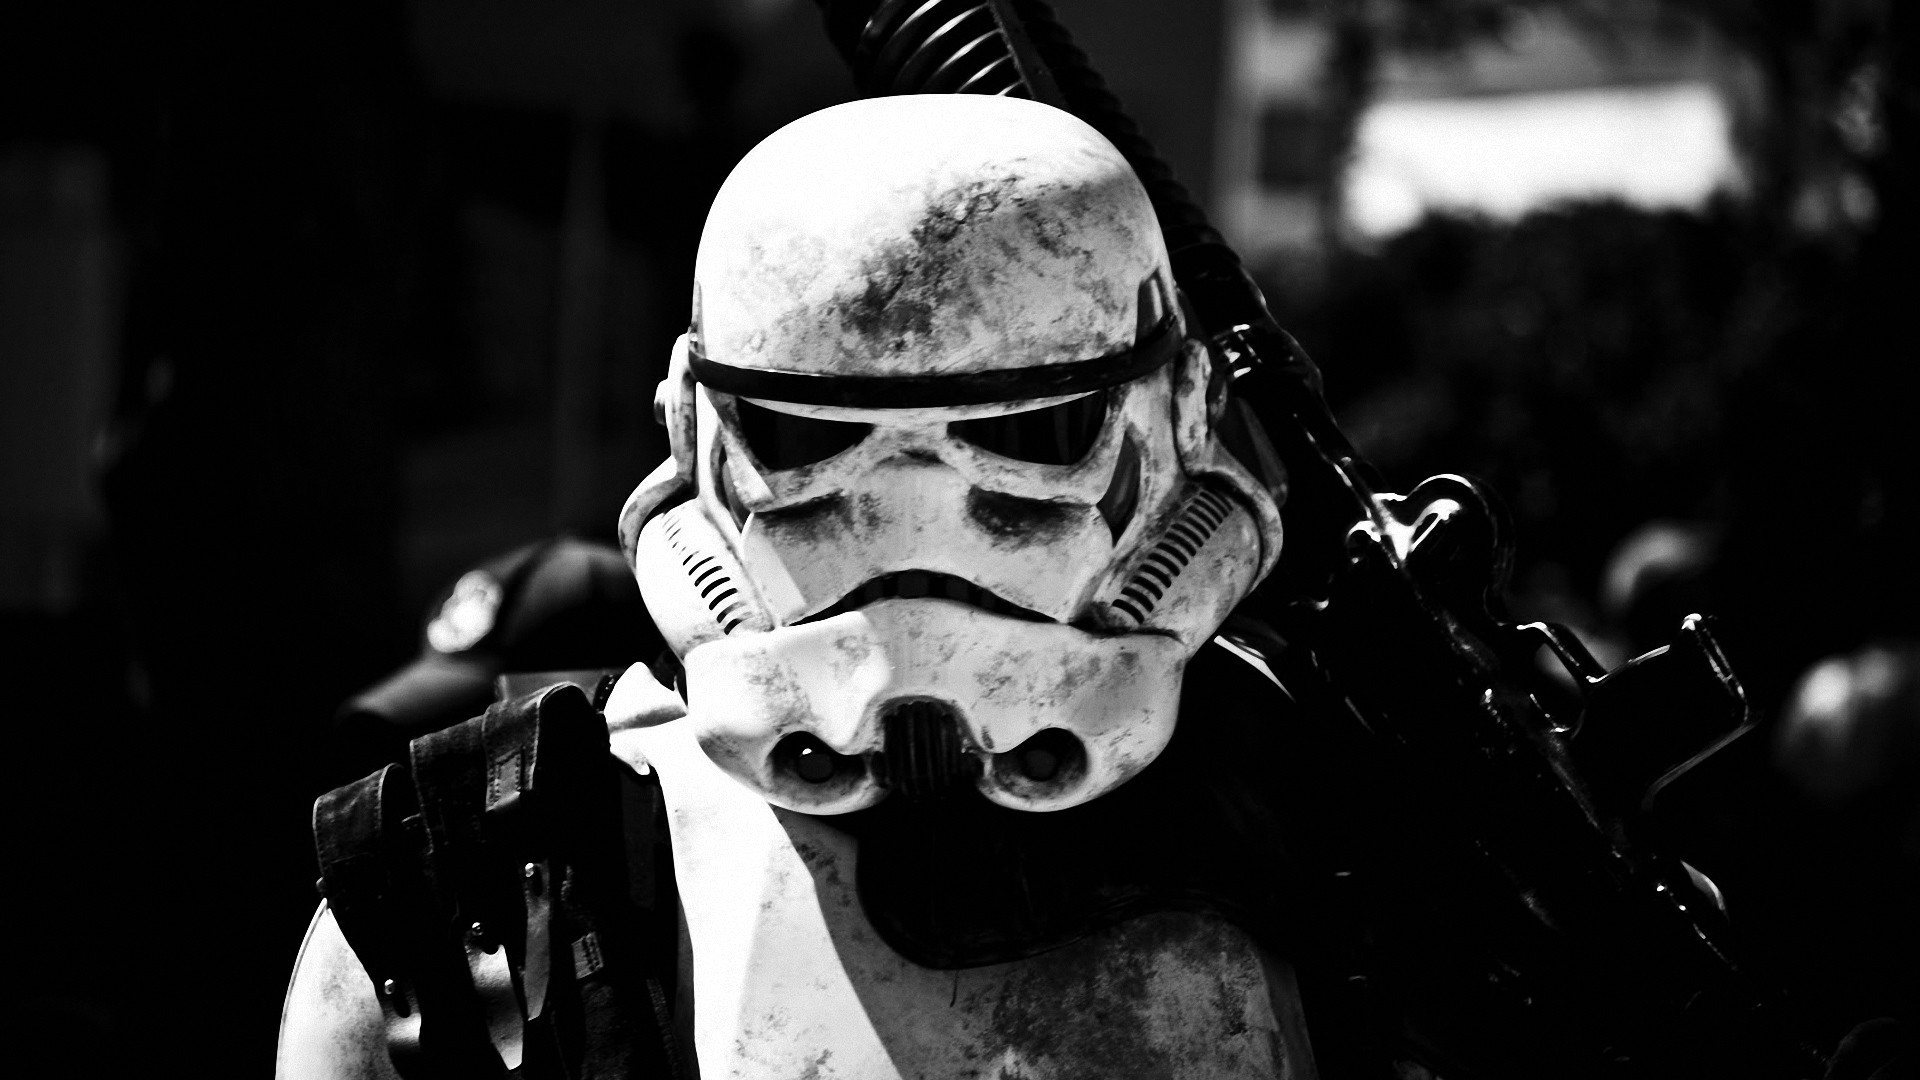 stormtrooper-movie-hd-wallpaper-1920x1080-2826